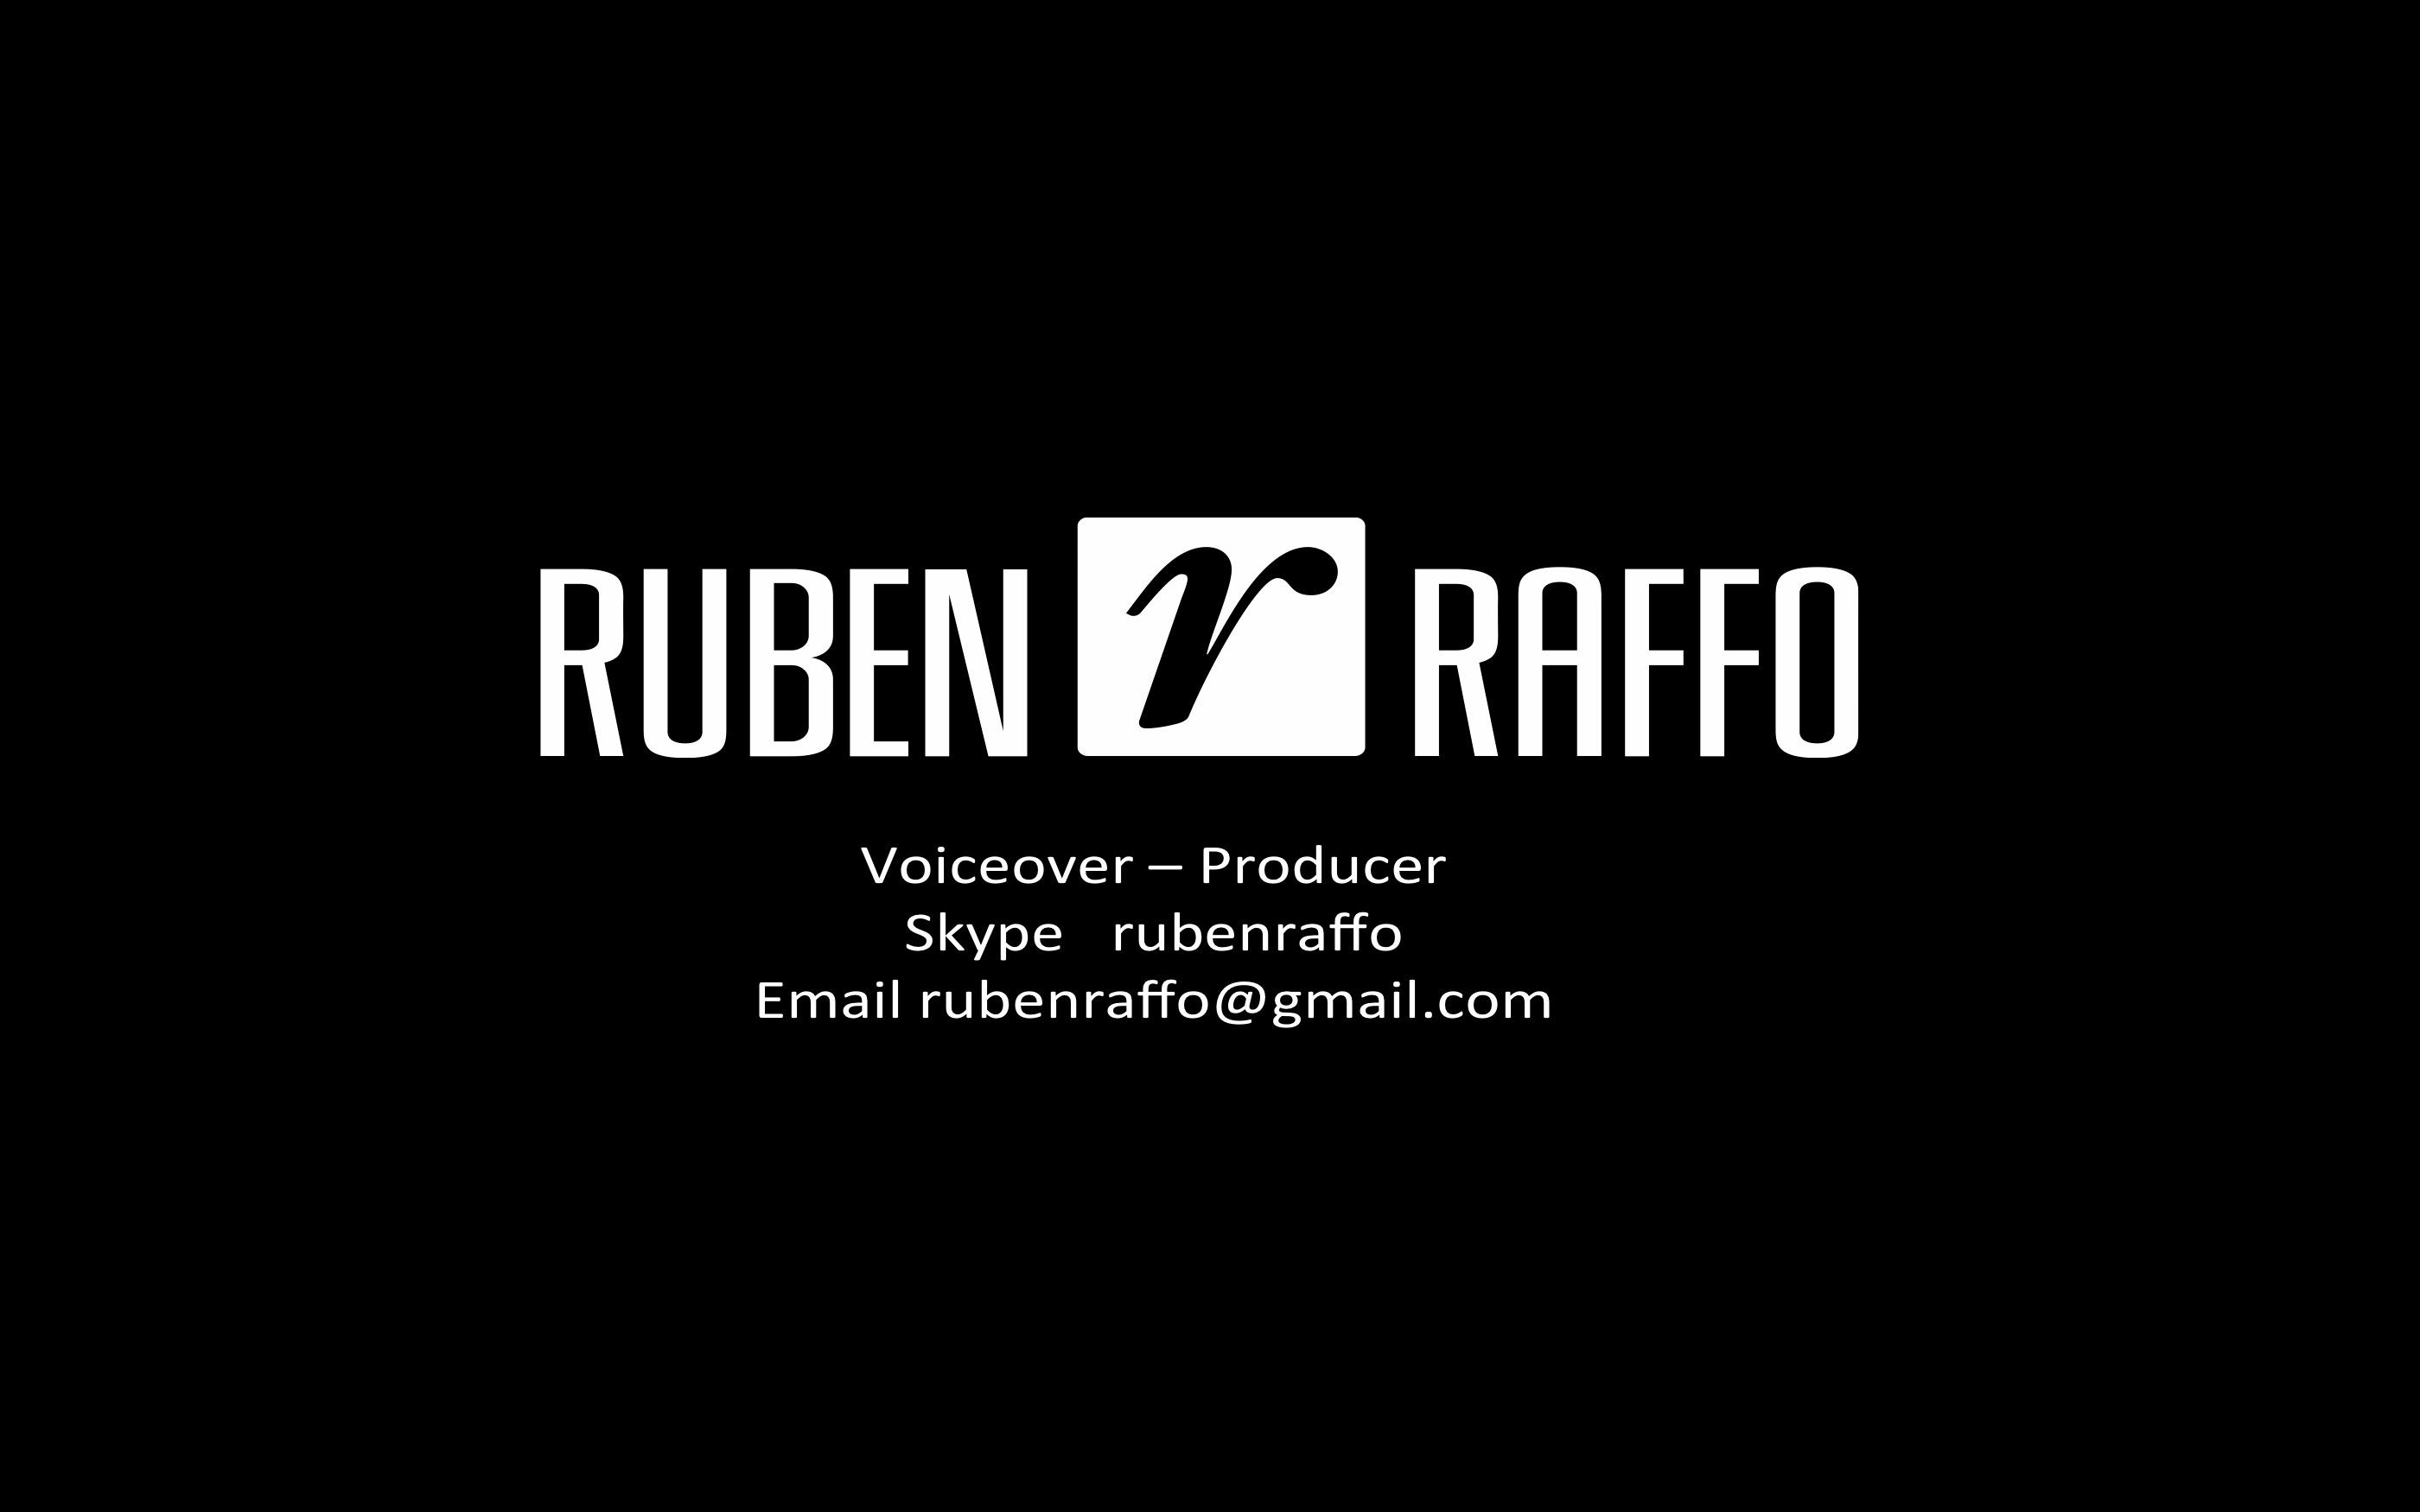 Ruben Raffo